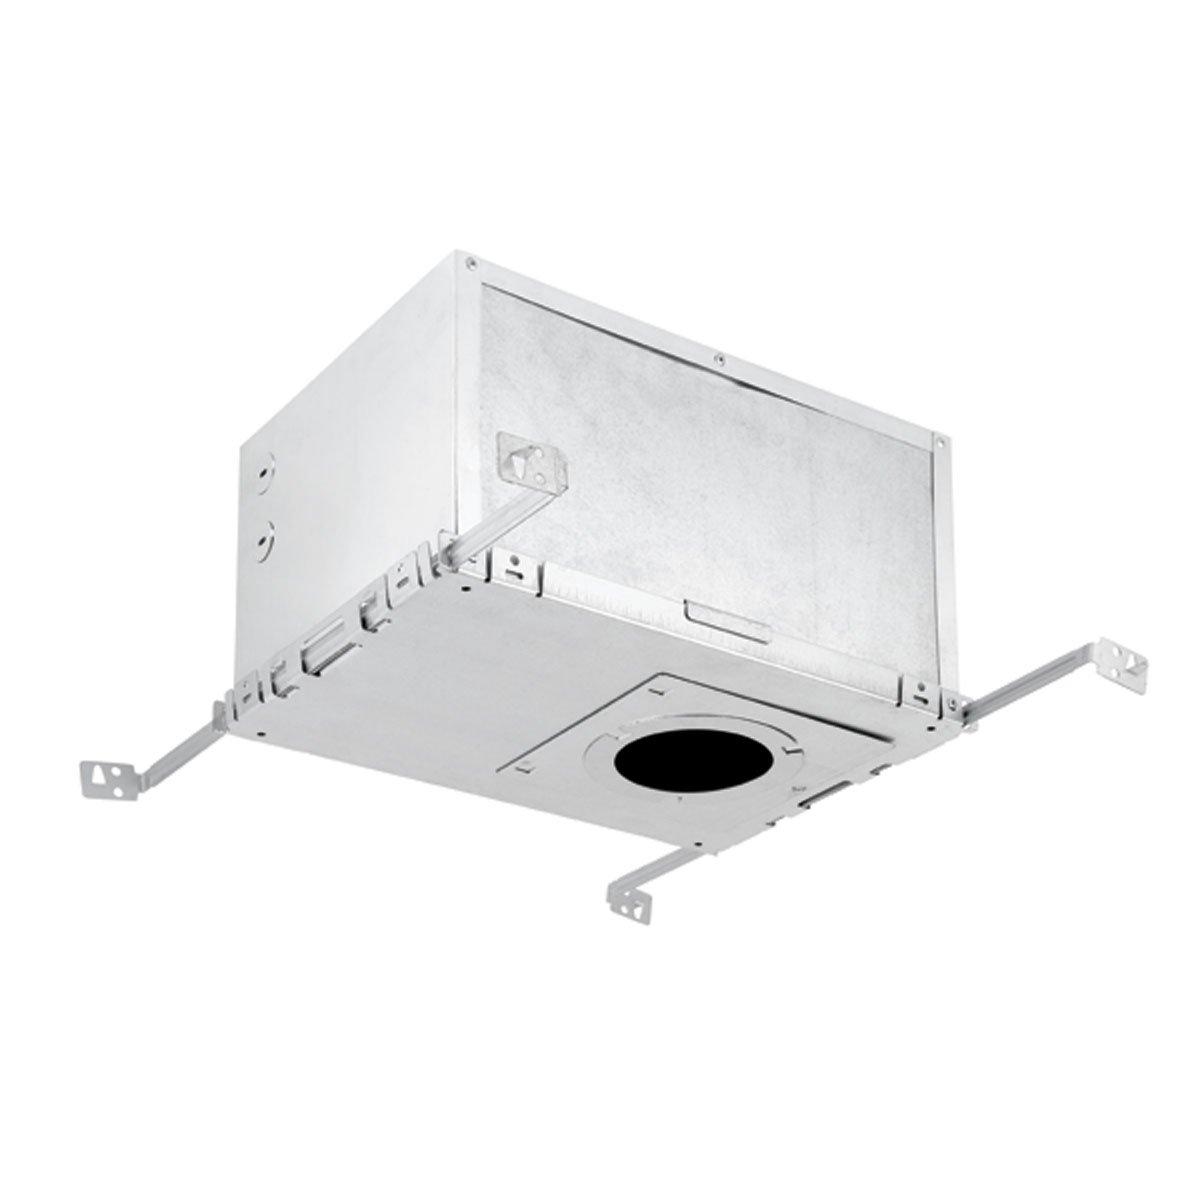 Recessed Lighting IC Rated Insulation Box, Aluminum Finish, Globe Electric 9212701